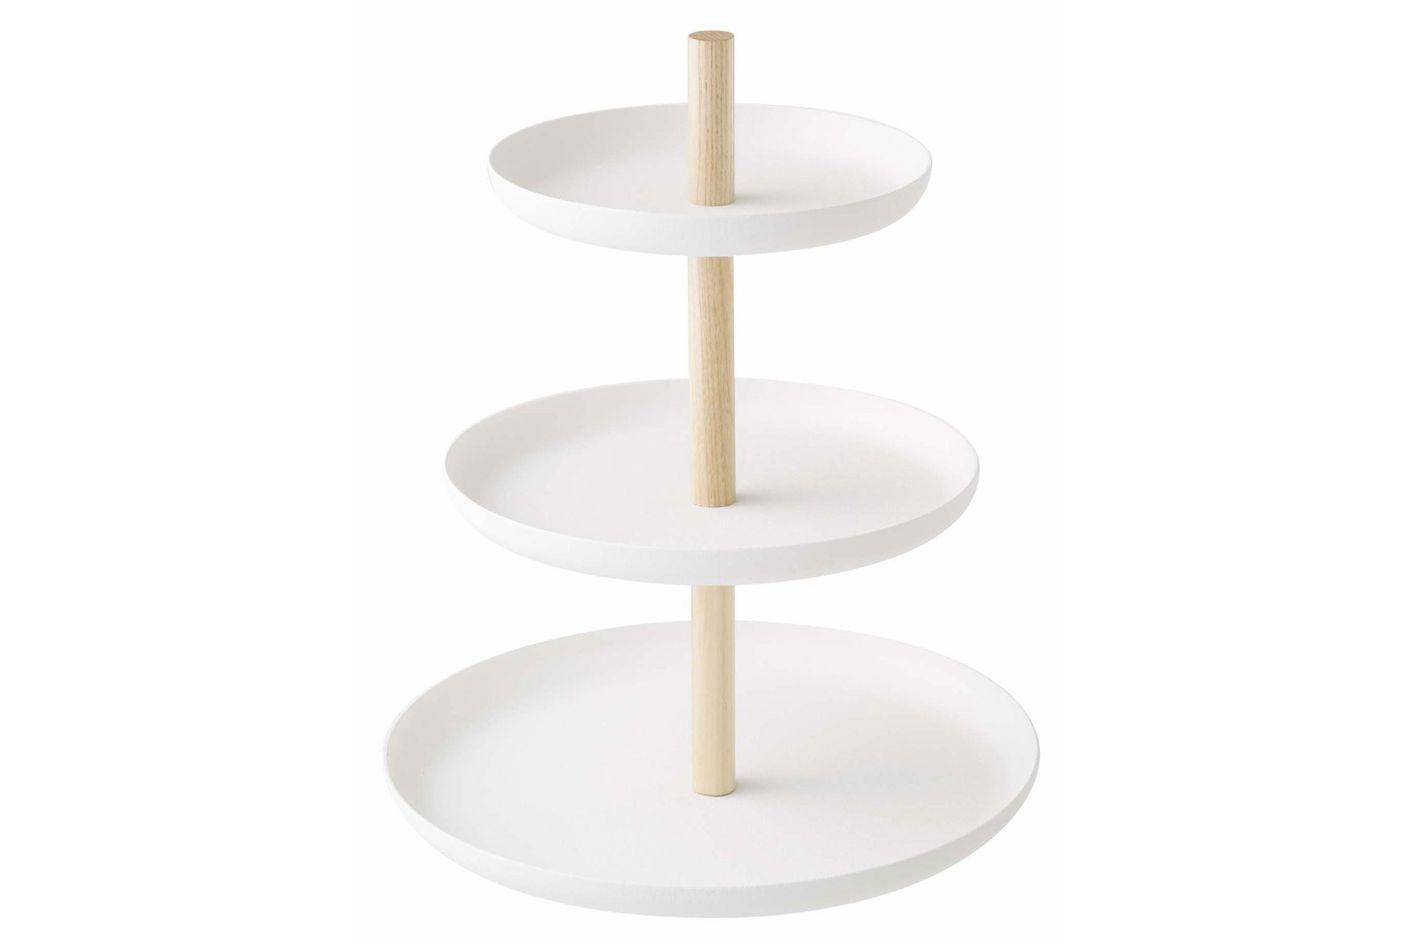 Yamazaki Home Tosca 2-Tier Cake Stand